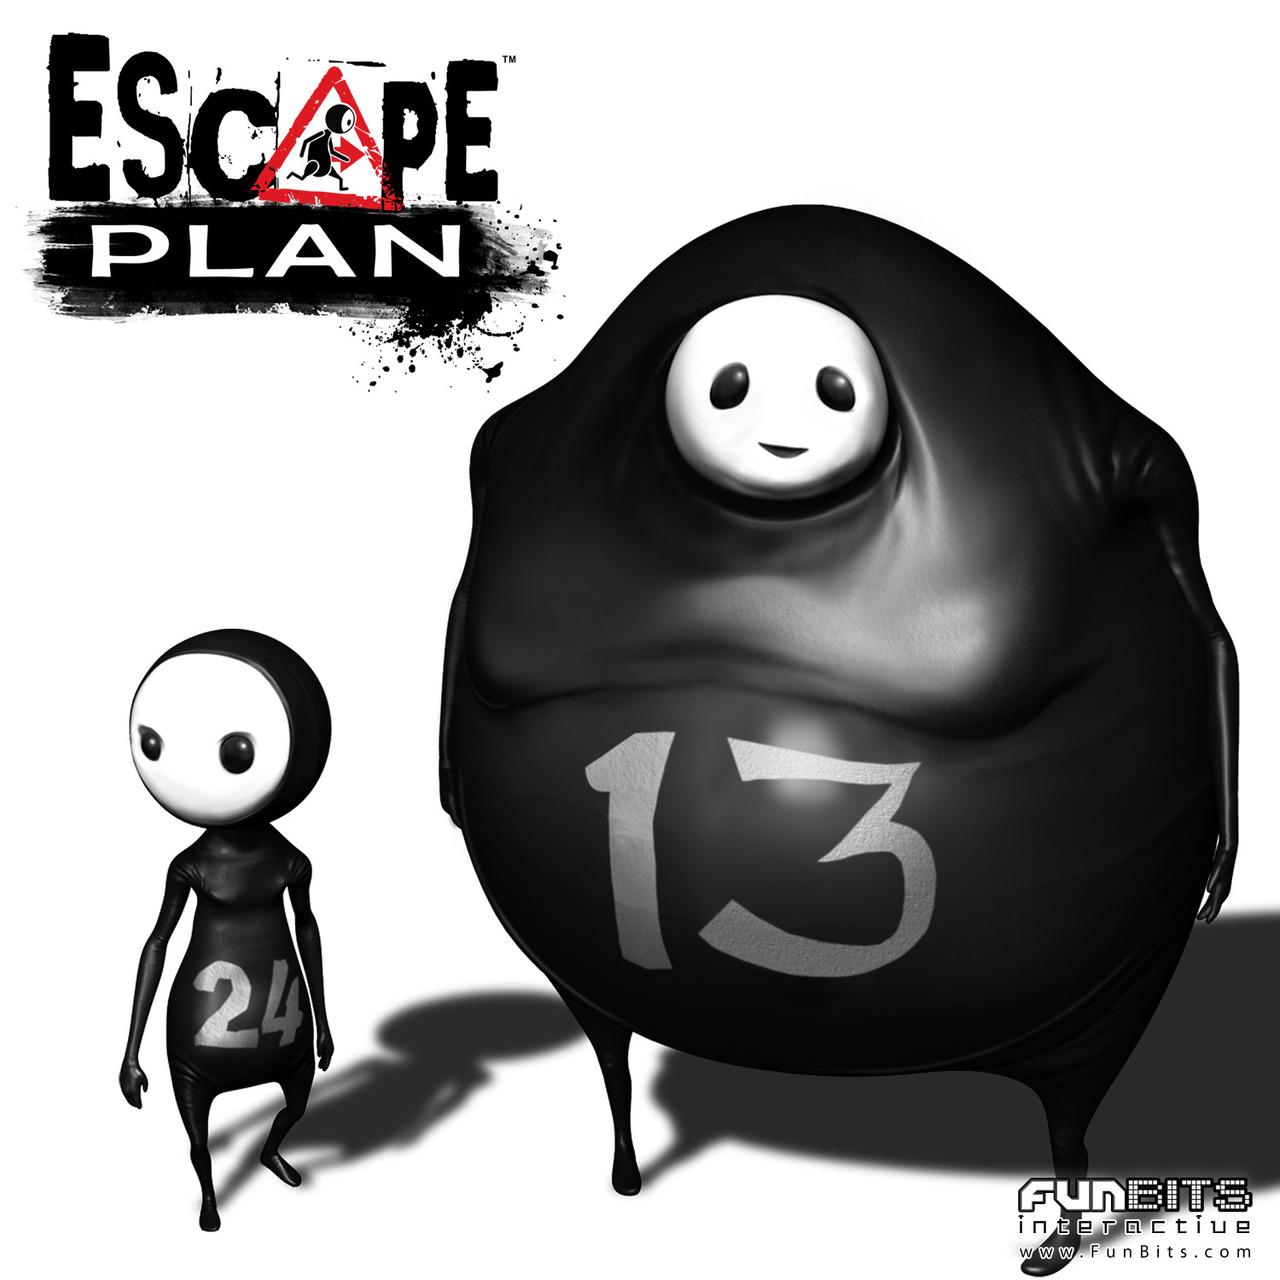 escape-plan-playstation-vita-1313521009-001.jpg